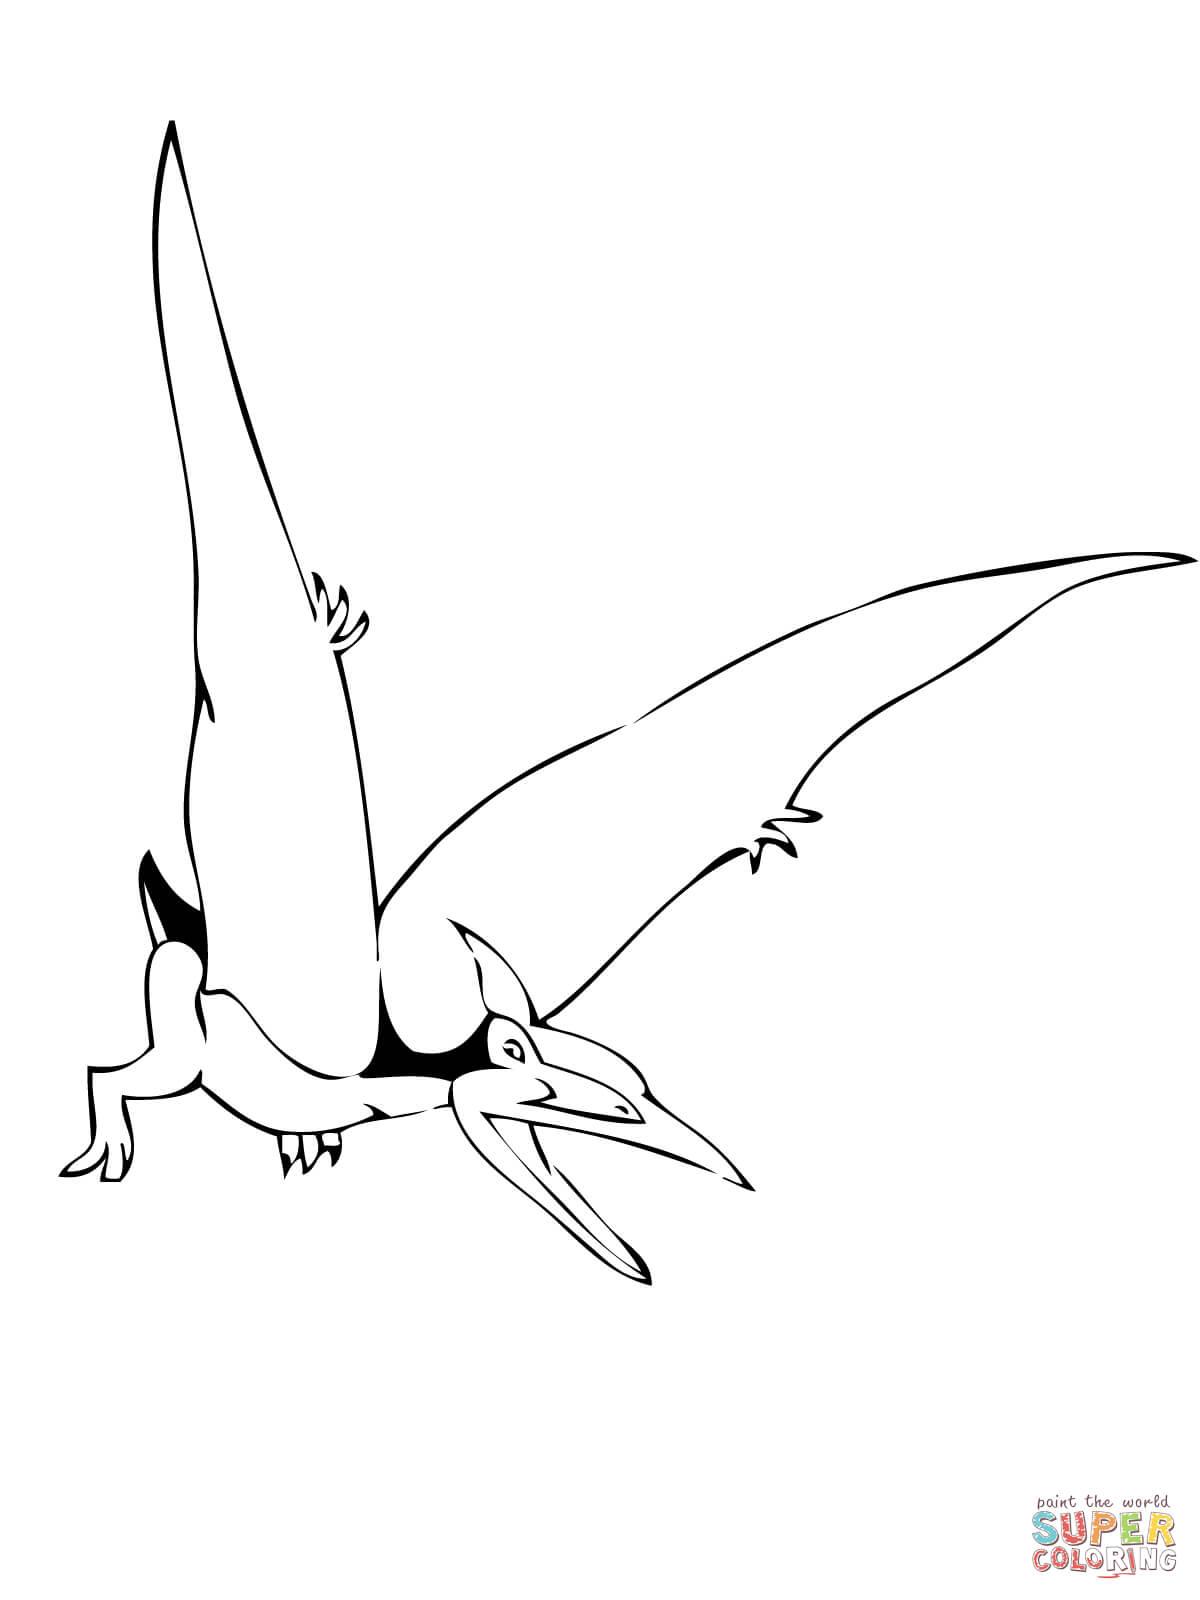 pteranodon drawing at getdrawings  free download